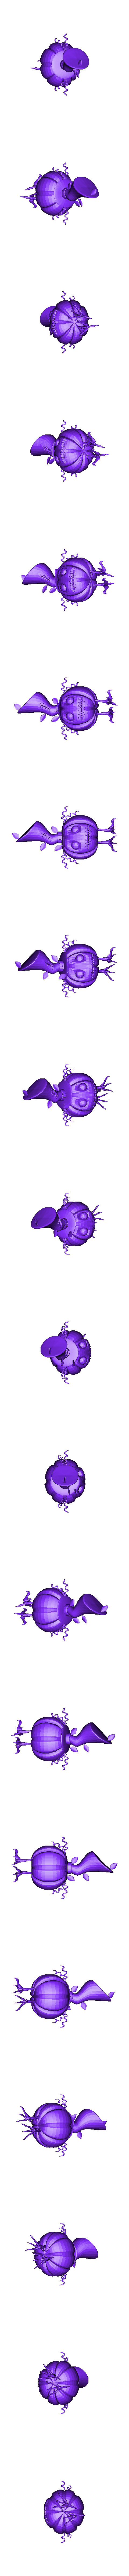 untitled.stl Download free STL file Cute  pumpkin • 3D printing object, Boris3dStudio